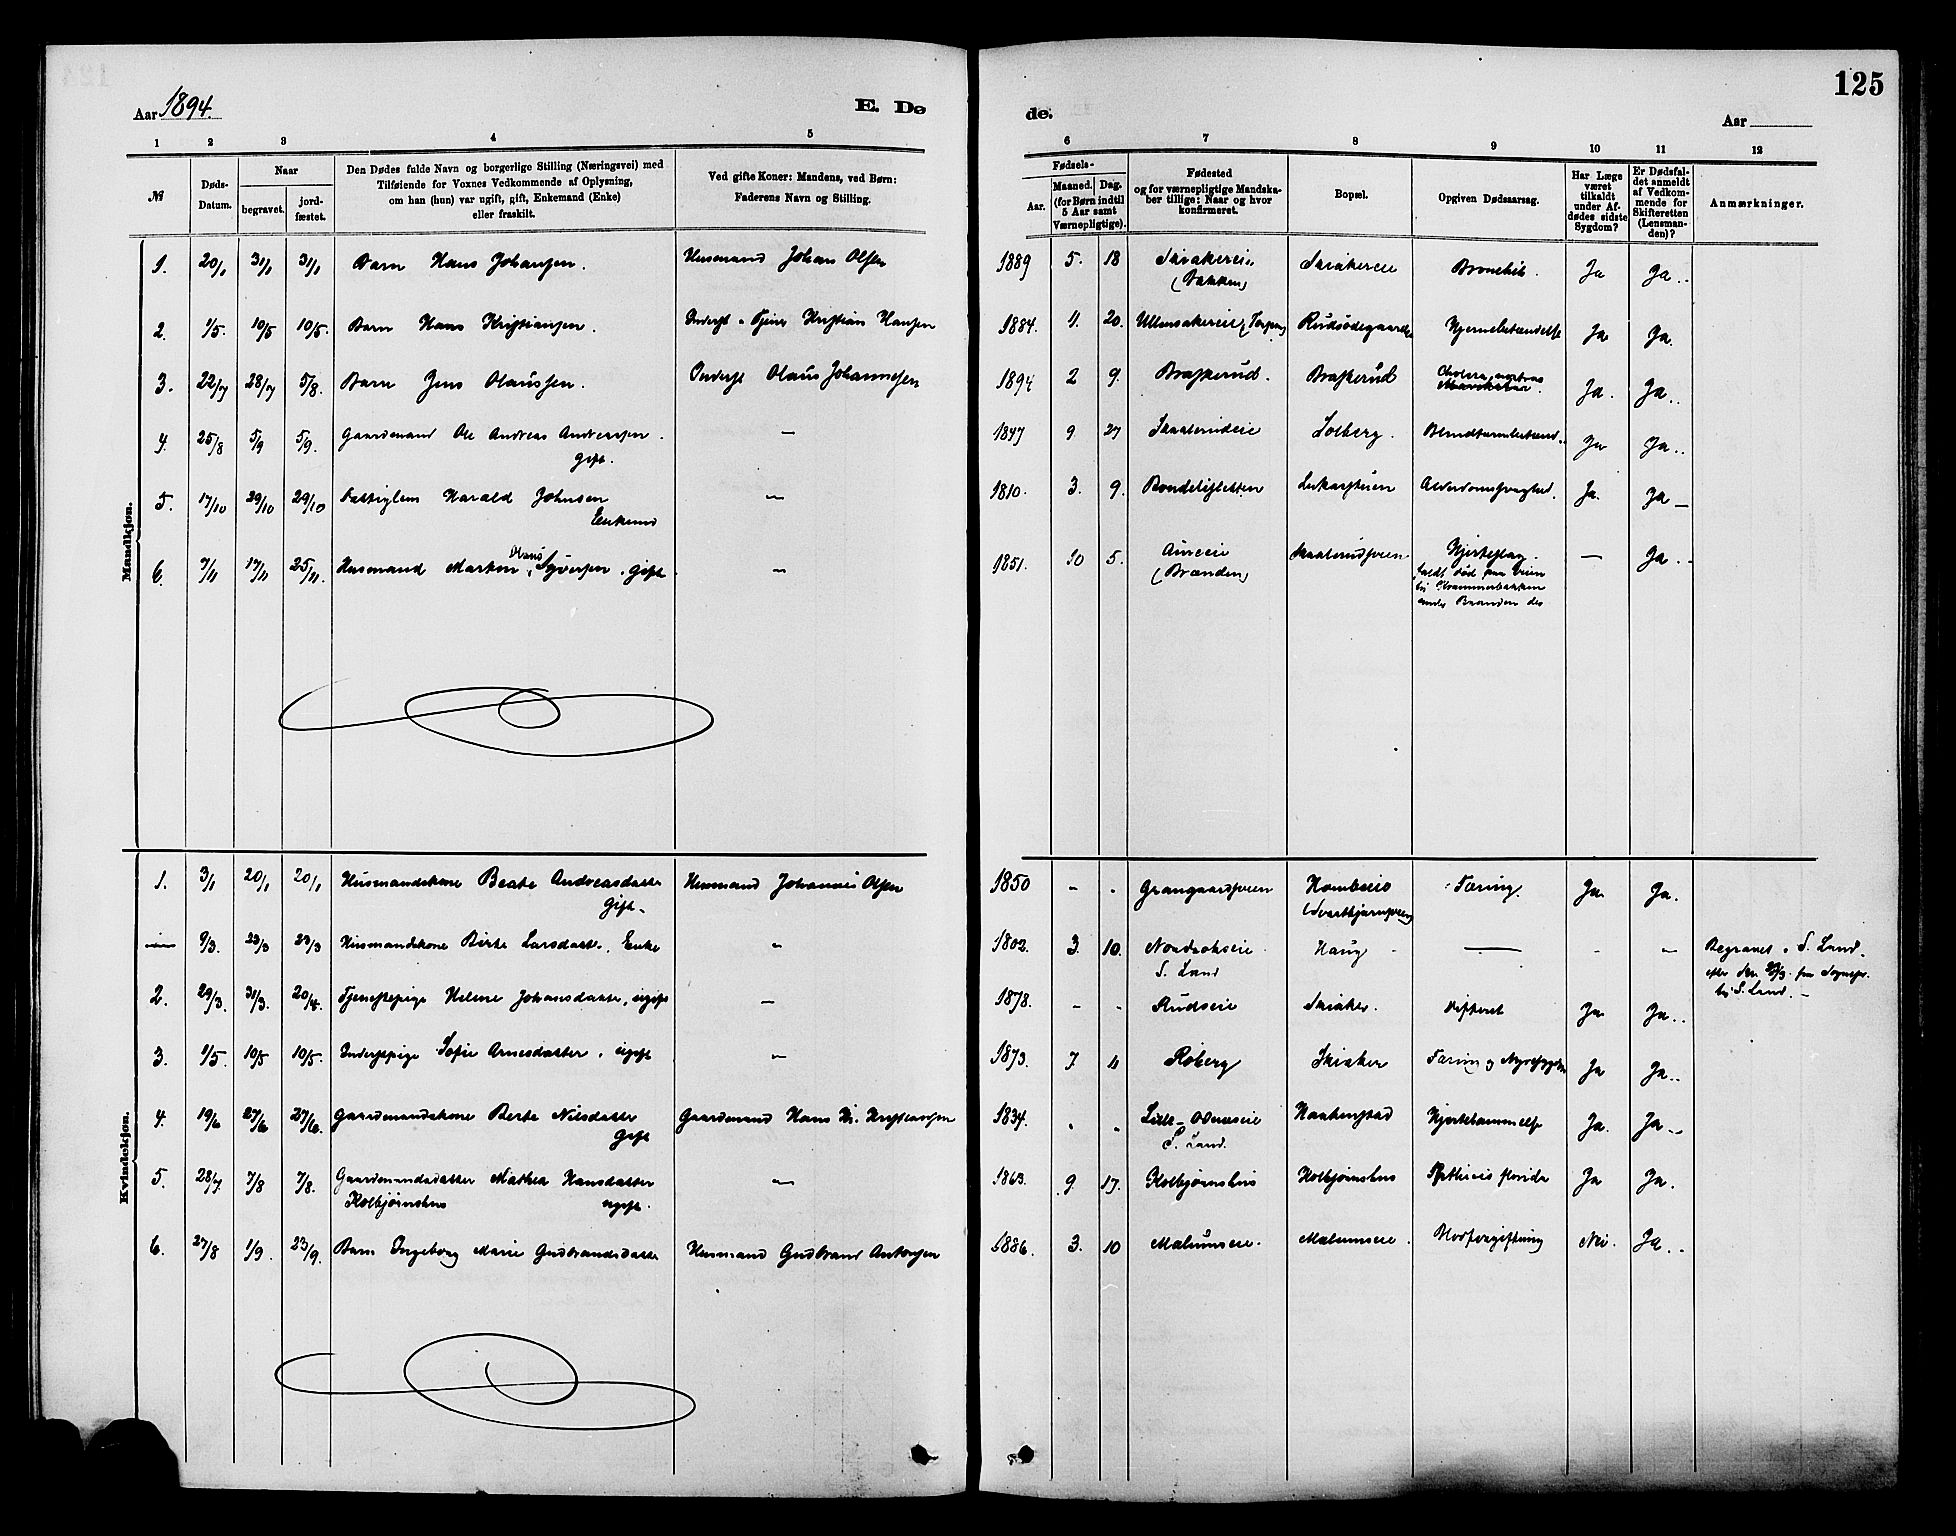 SAH, Nordre Land prestekontor, Ministerialbok nr. 3, 1882-1896, s. 125